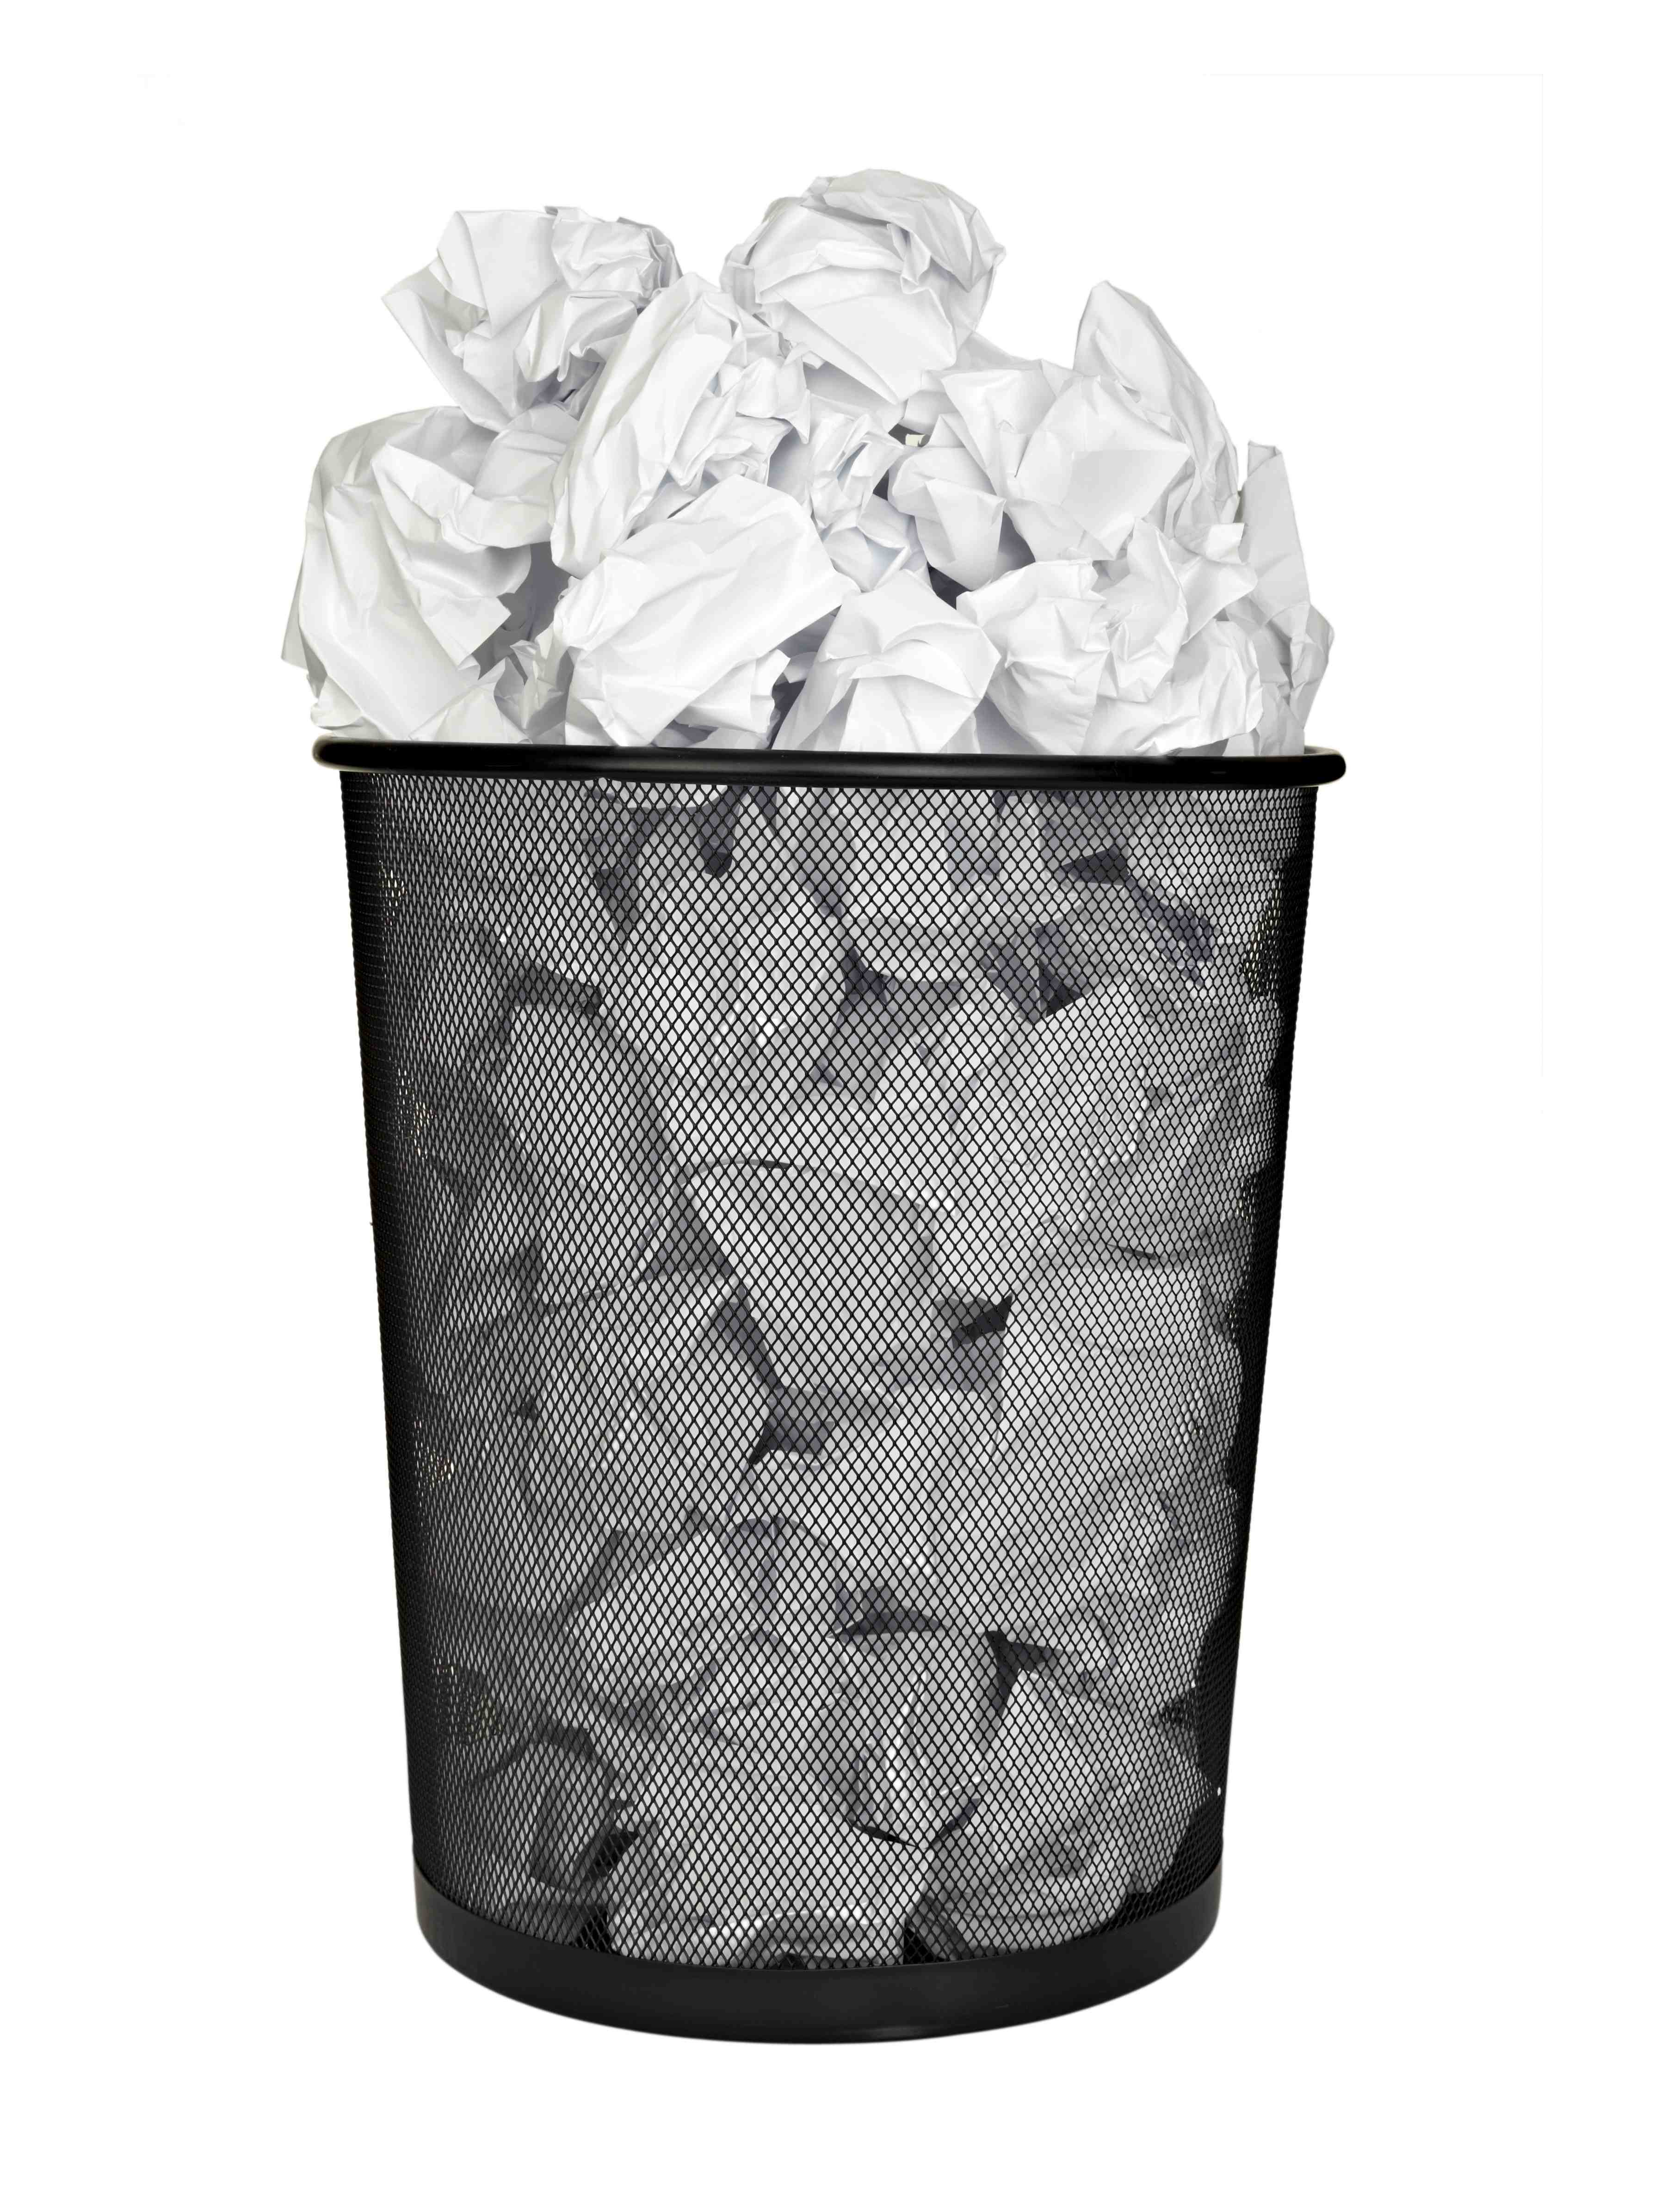 paper ball waste paper bin office business